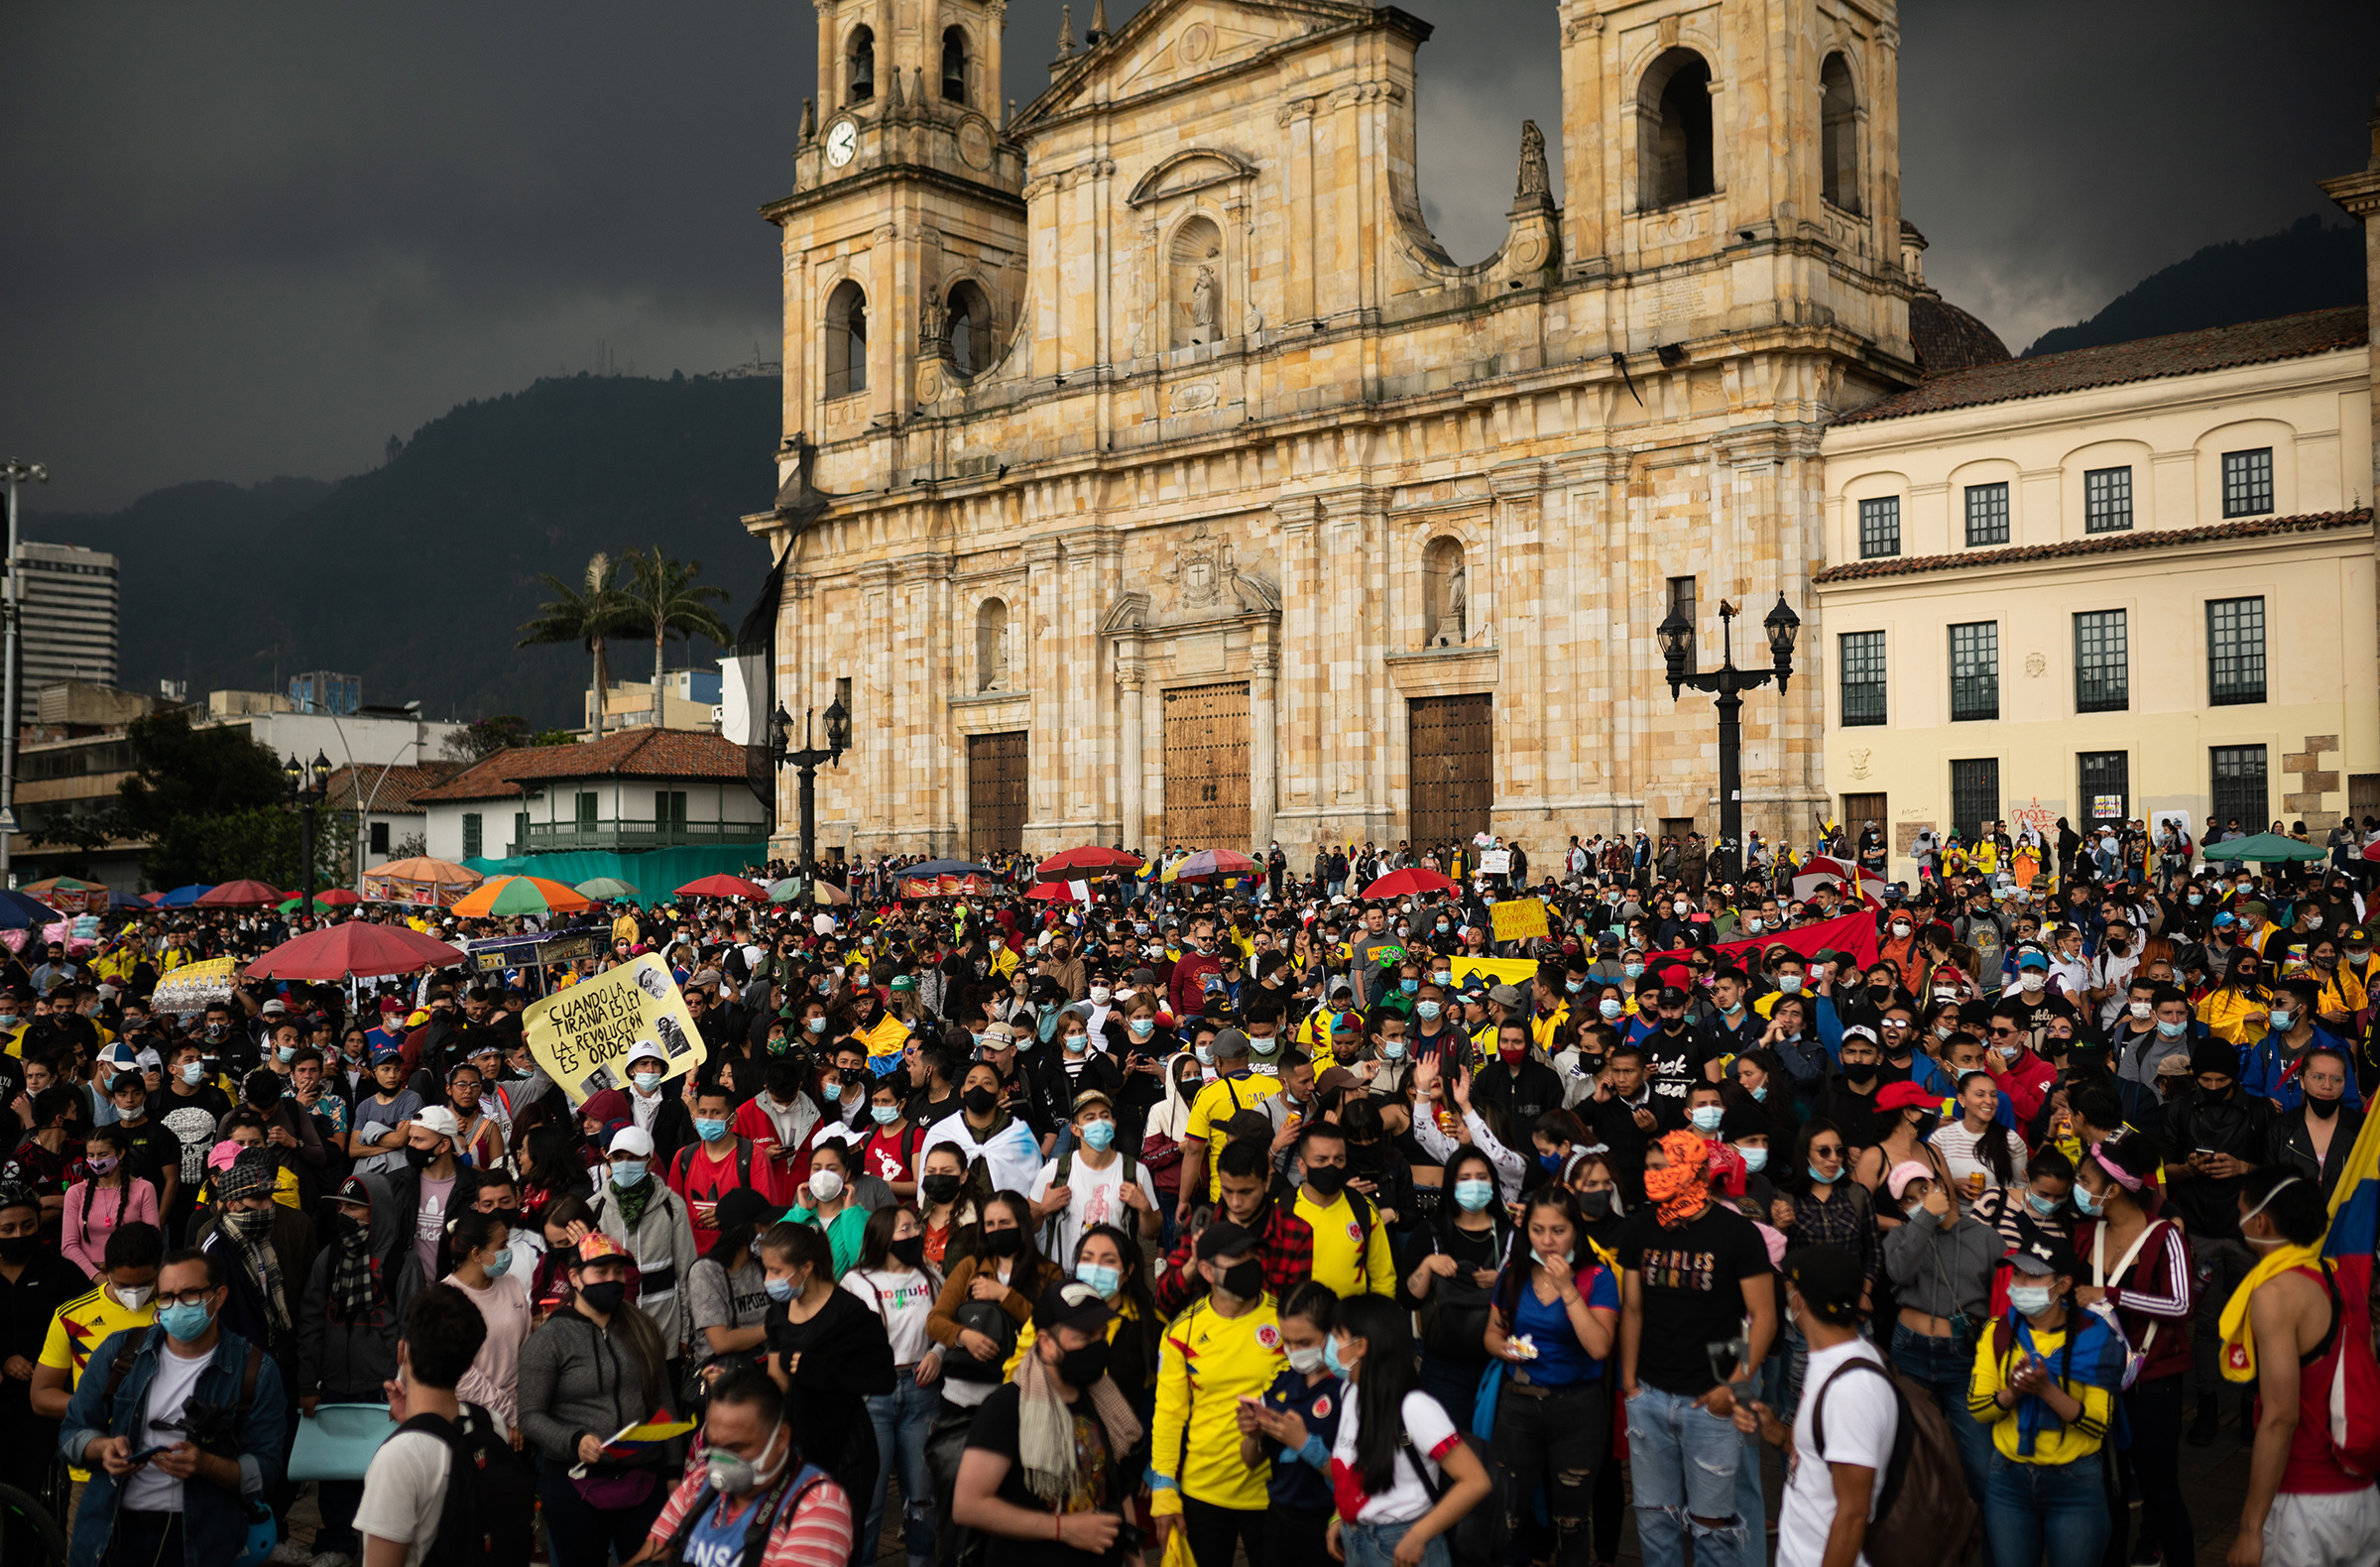 Hundreds of marchers arrive at the Plaza de Bolivar in Bogotá on May 1.